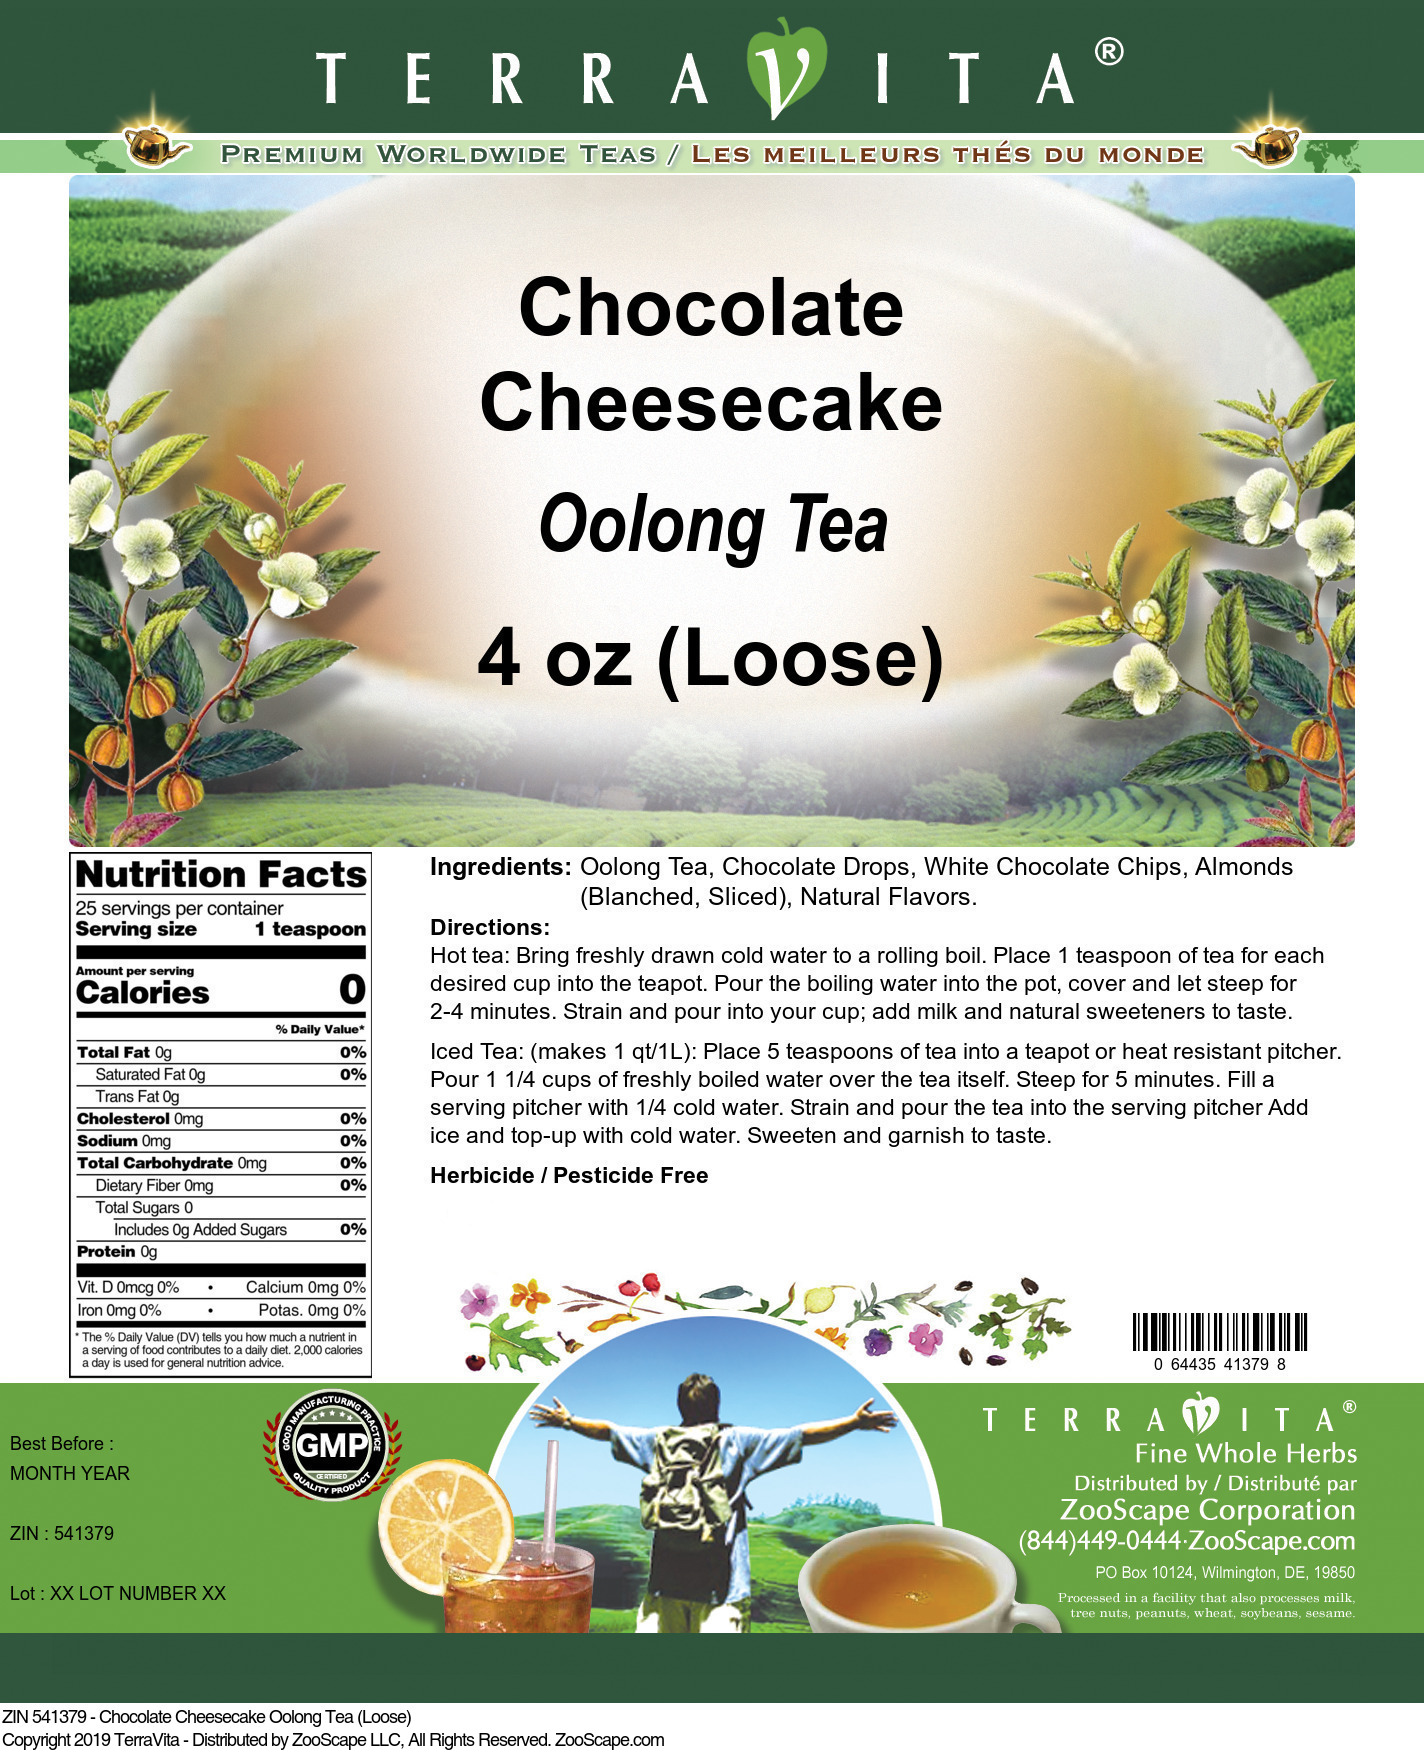 Chocolate Cheesecake Oolong Tea